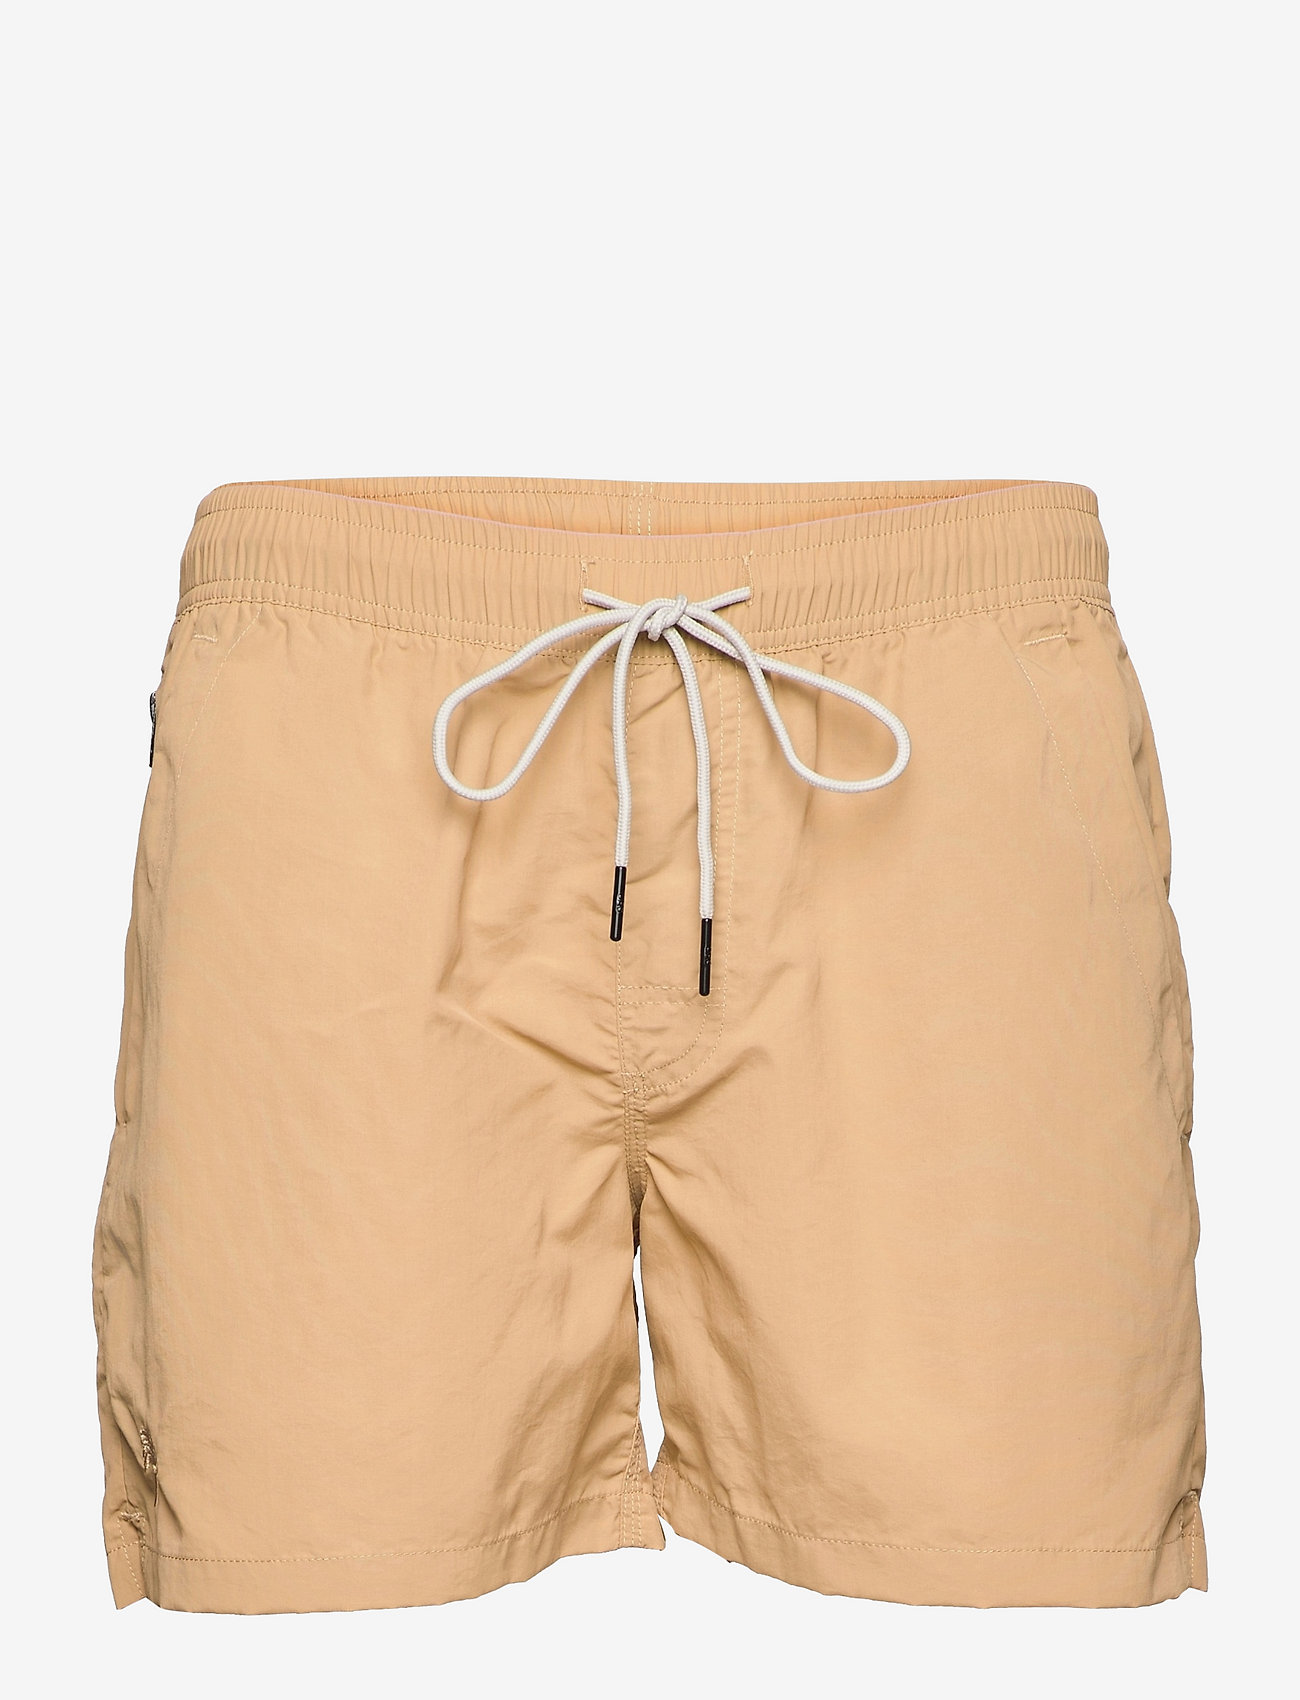 OAS - Beige Nylon Swim Shorts - shorts - beige - 0